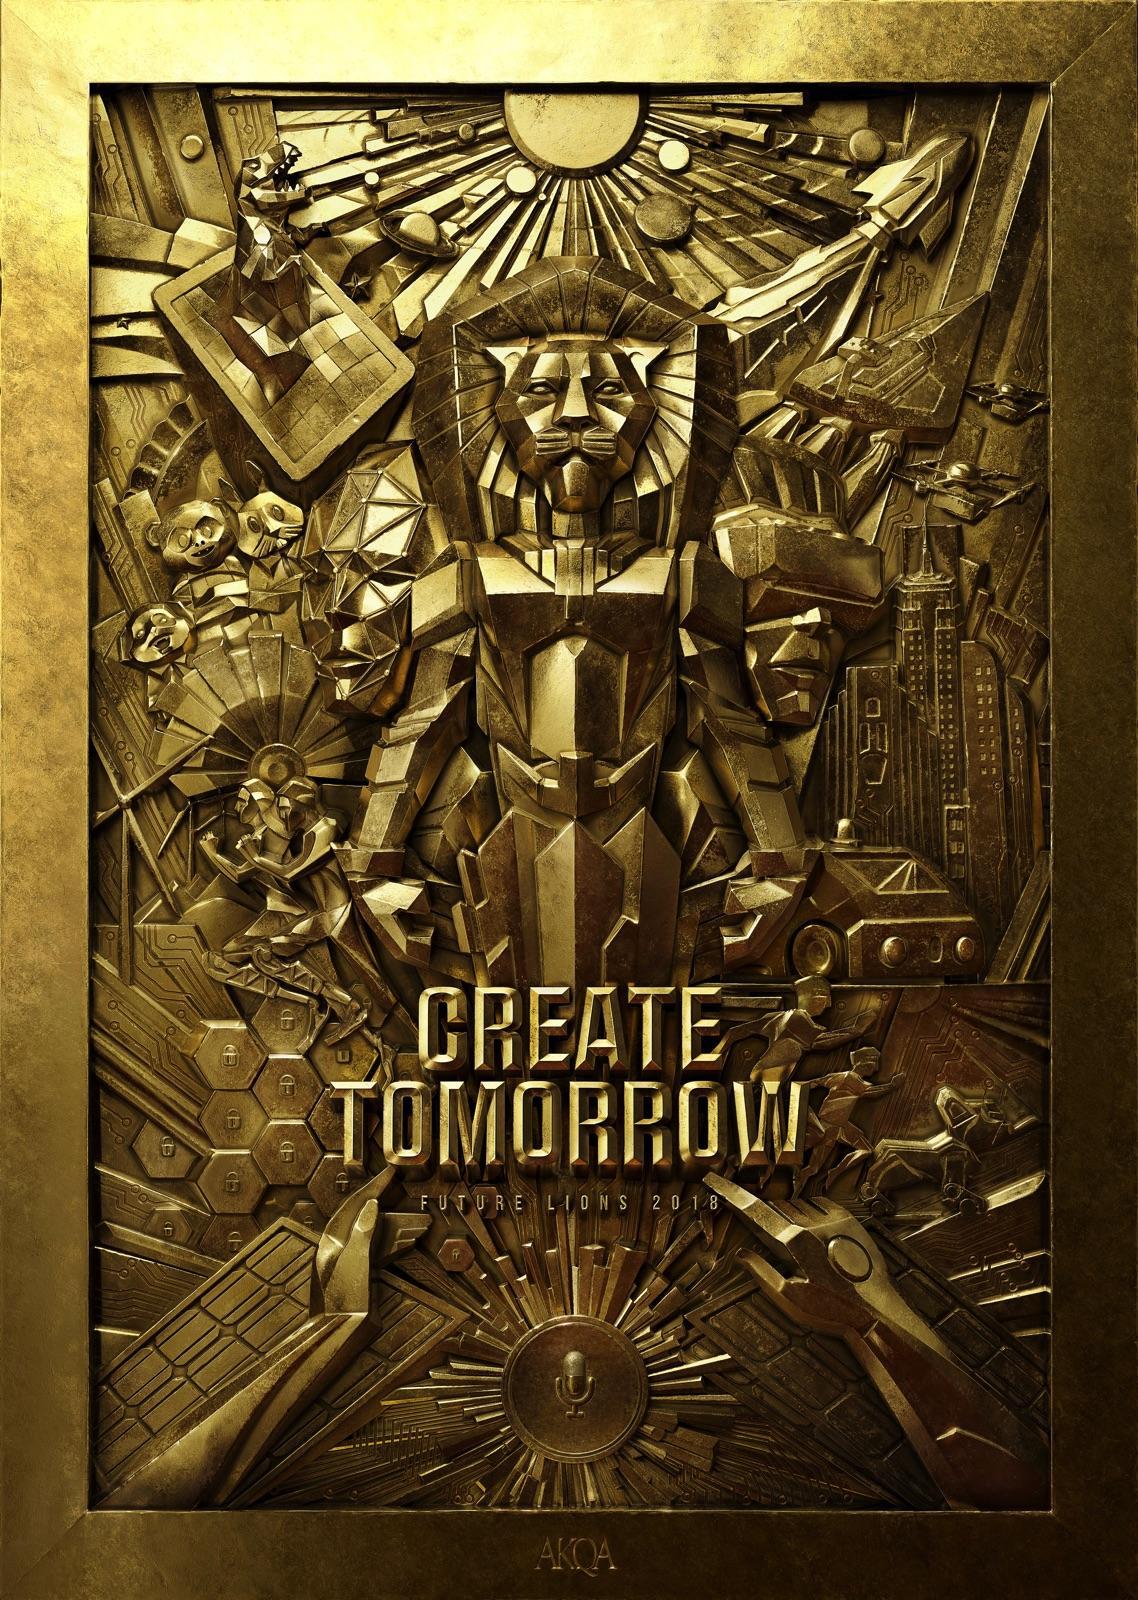 AKQA Print Ad - Future Lions 2018 Call for Entries